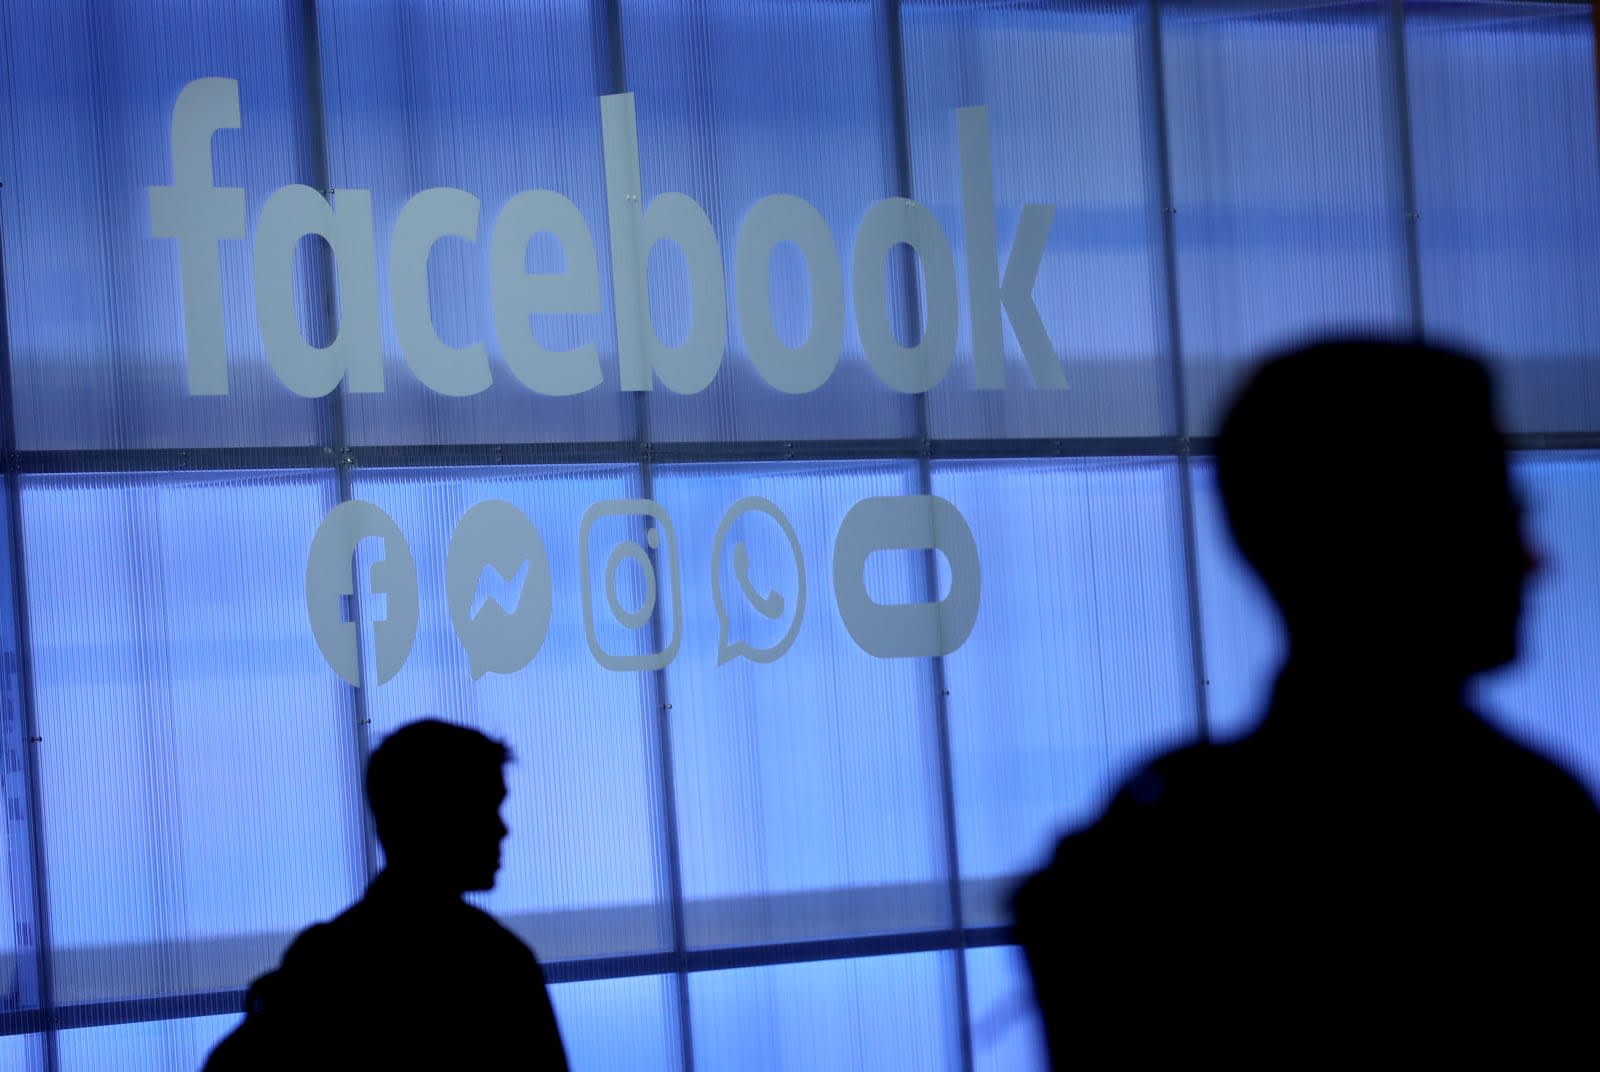 Facebook has taken down over 2 billion fake accounts in 2019